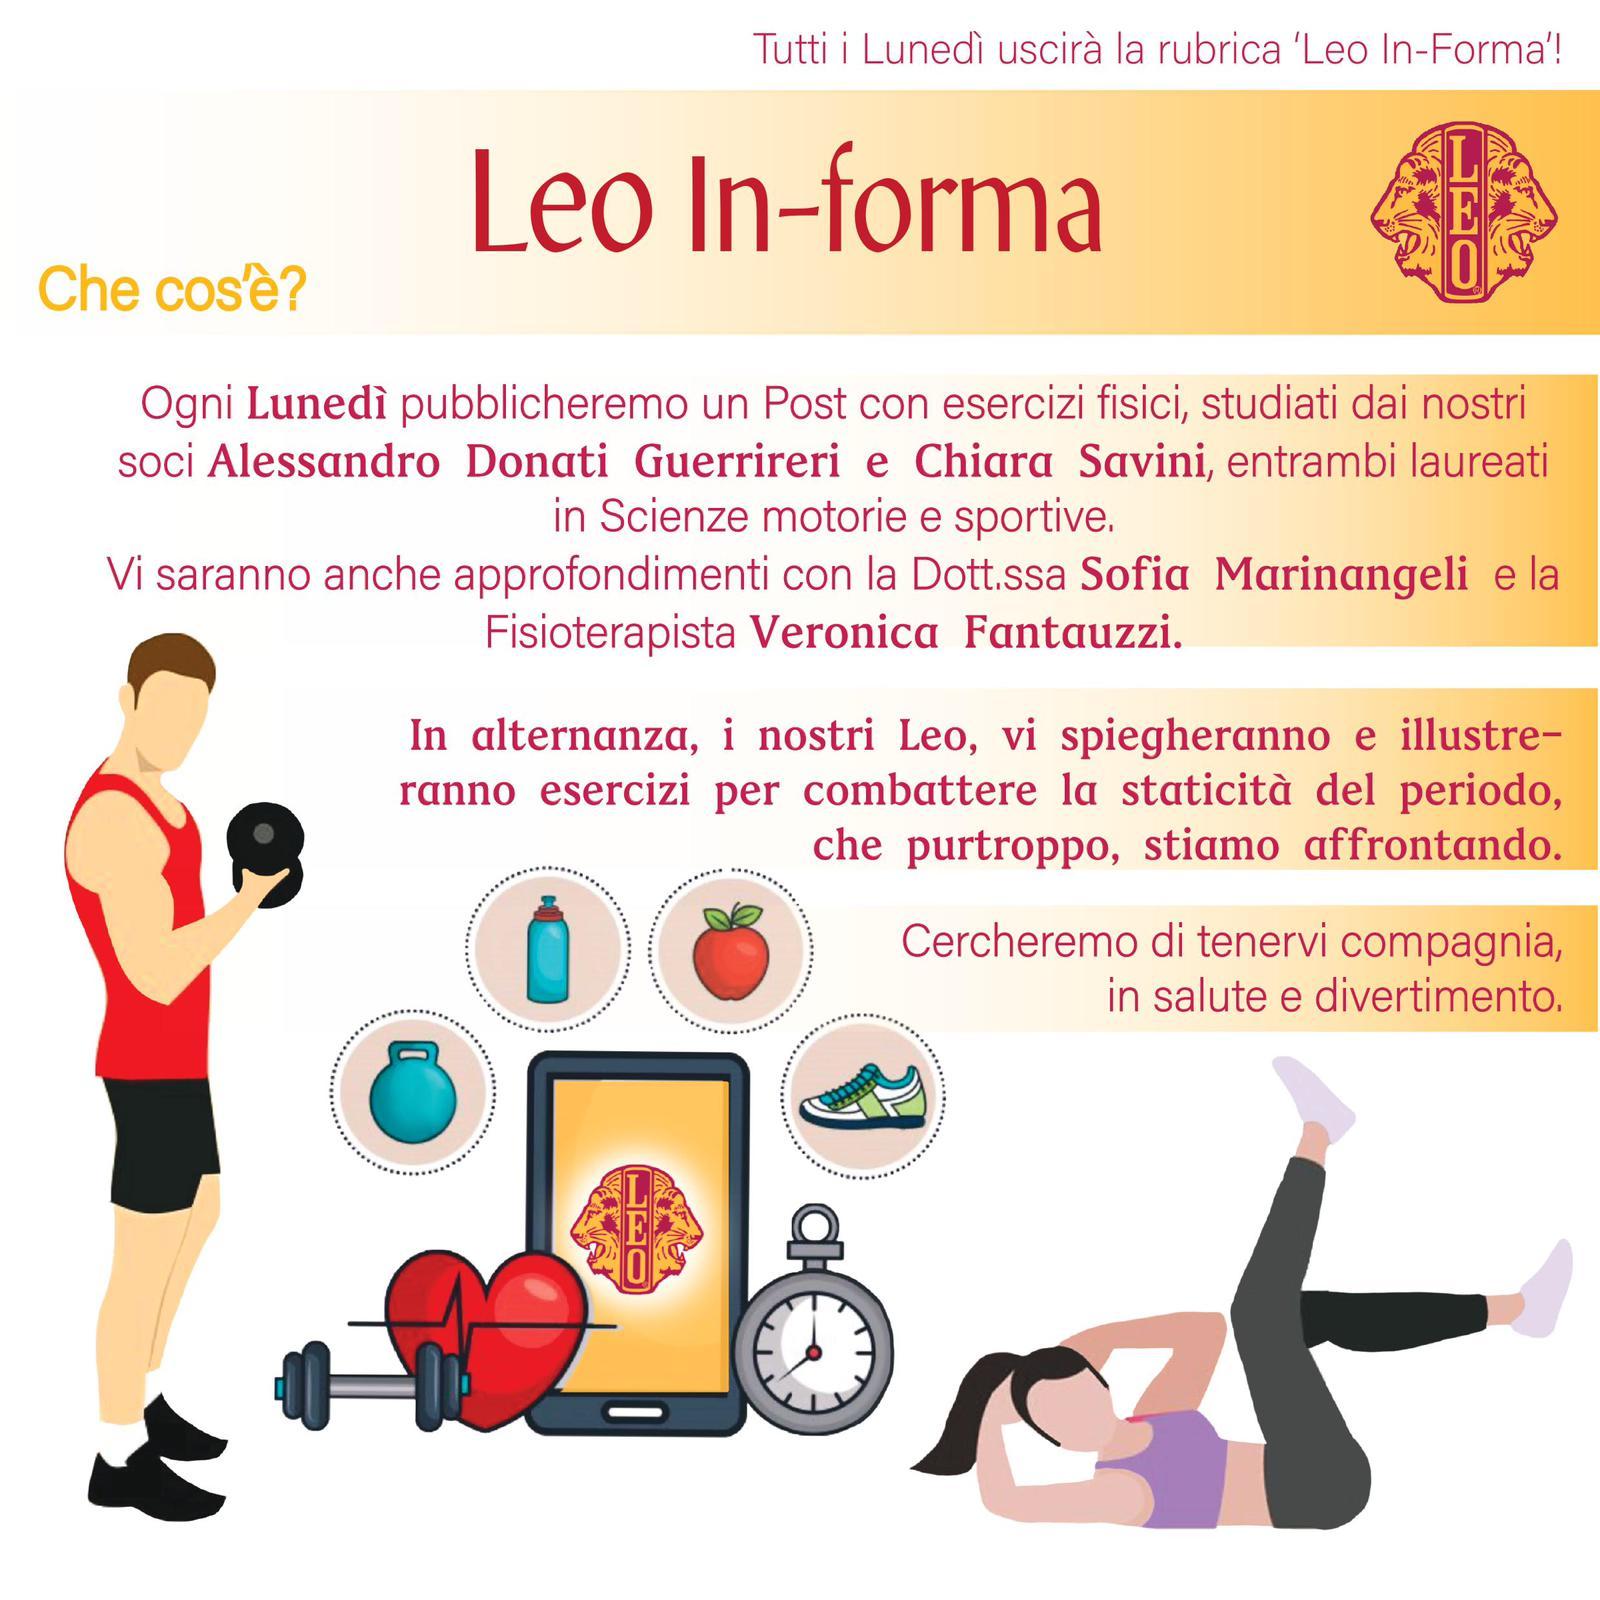 Leo in-forma